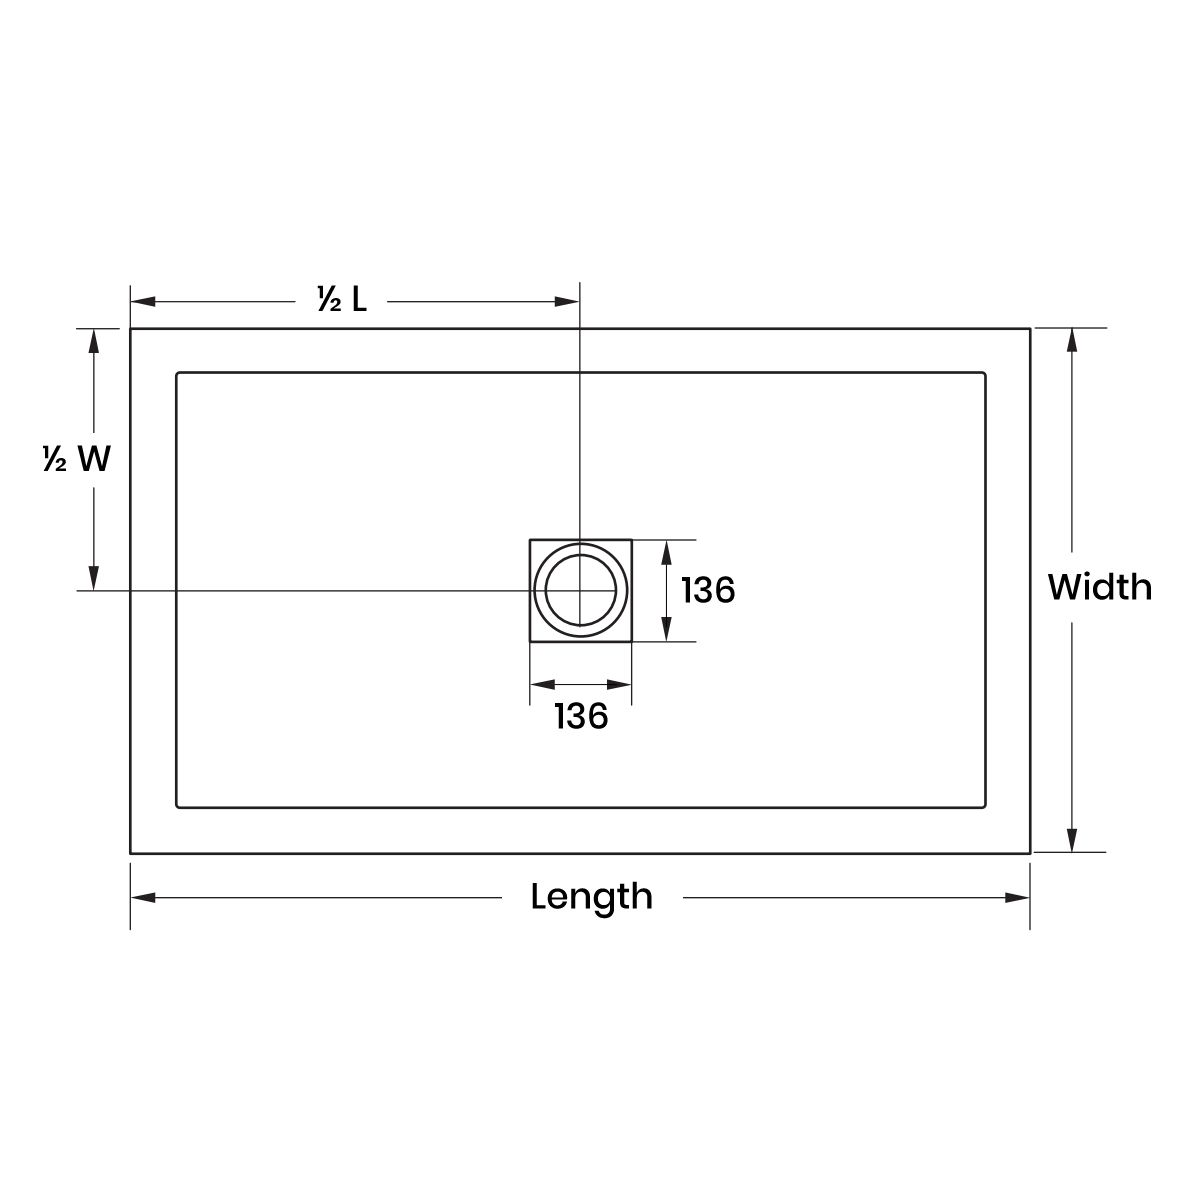 Aquadart Black Slate Shower Tray 1200 x 900 Dimension